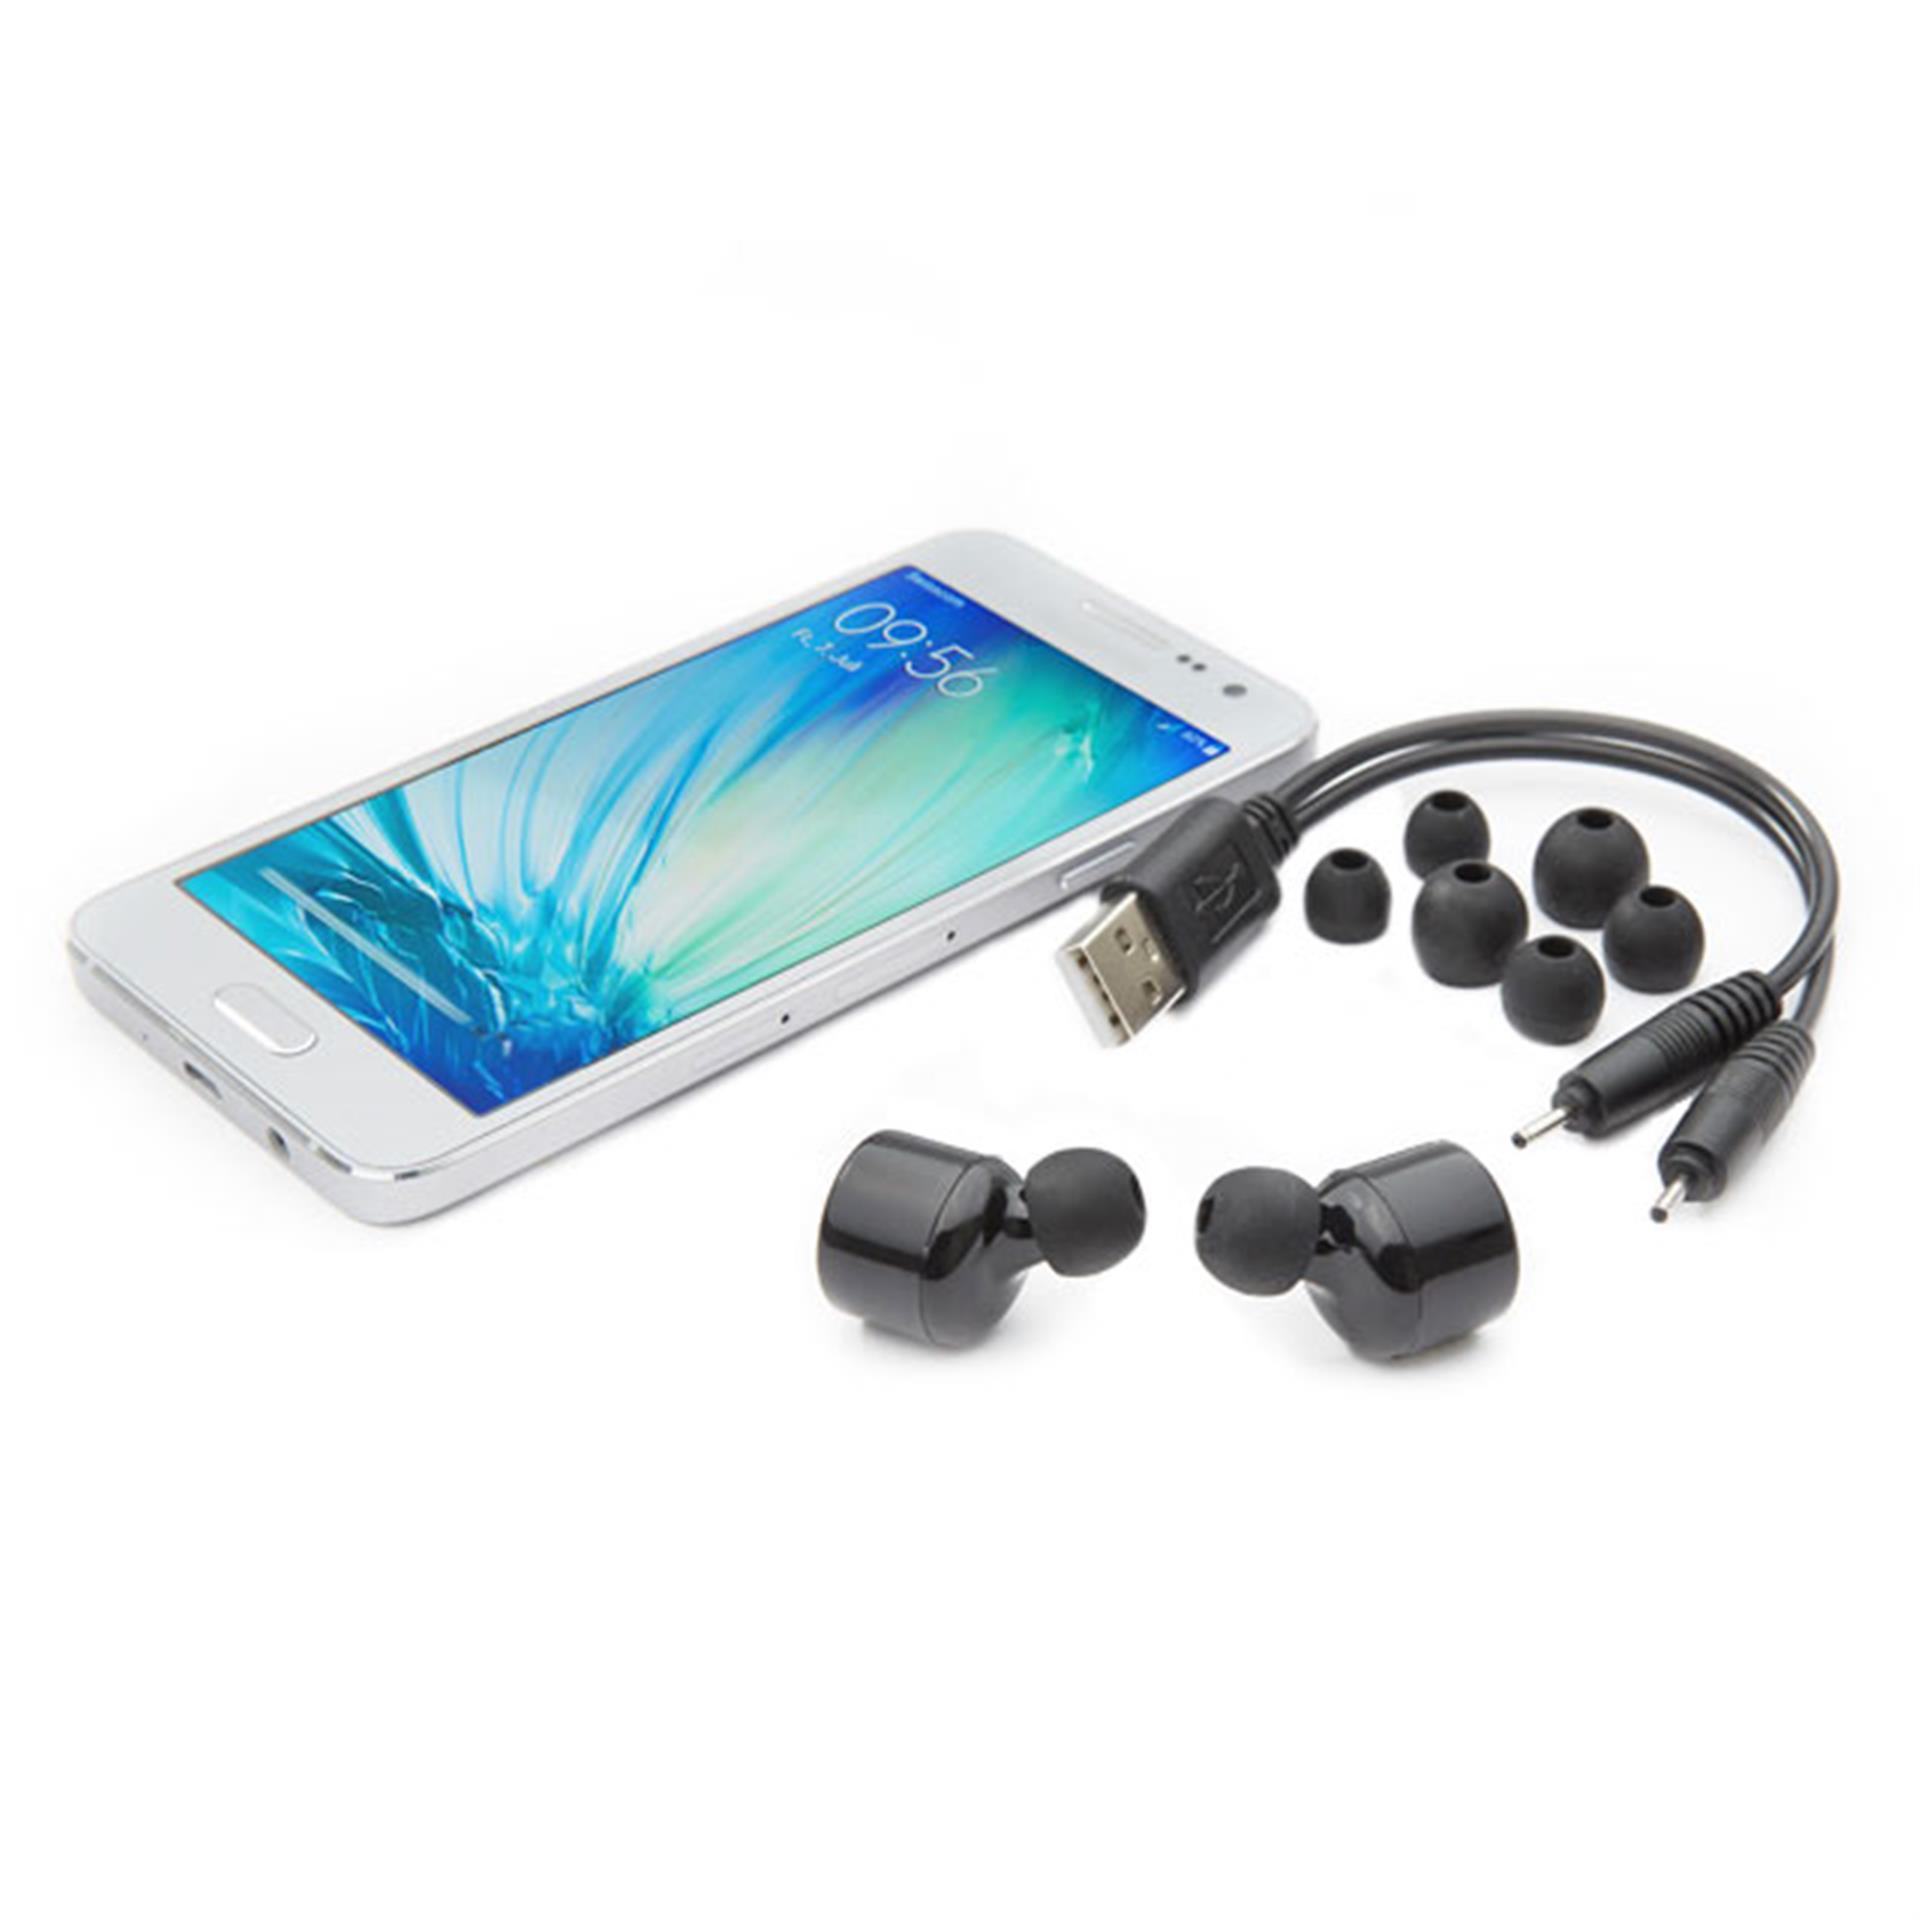 Knopf-Kopfhörer kabellos